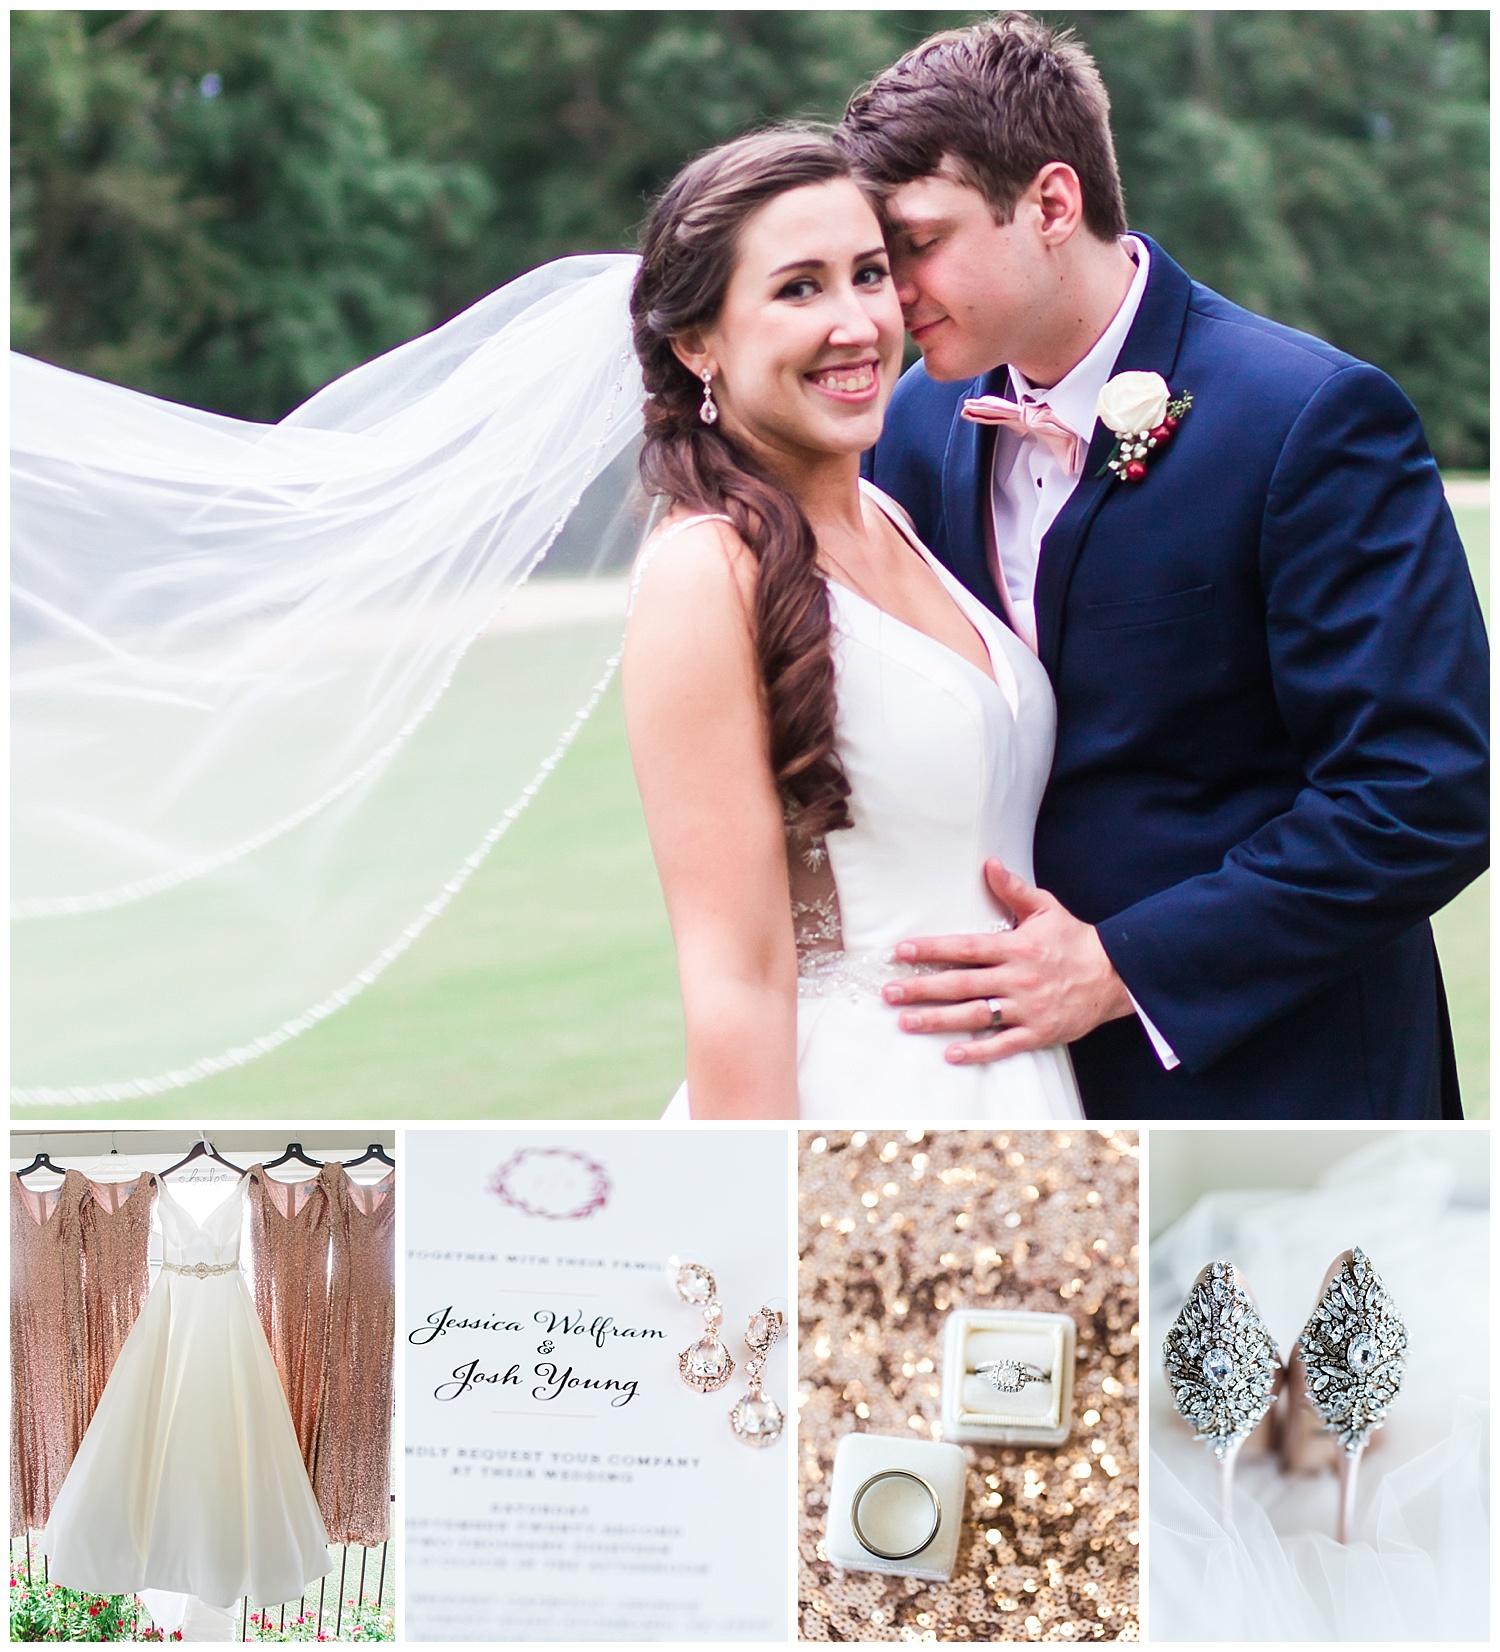 St. Bridget's Church - Brandermill Country Club - Virginia Wedding Photographer